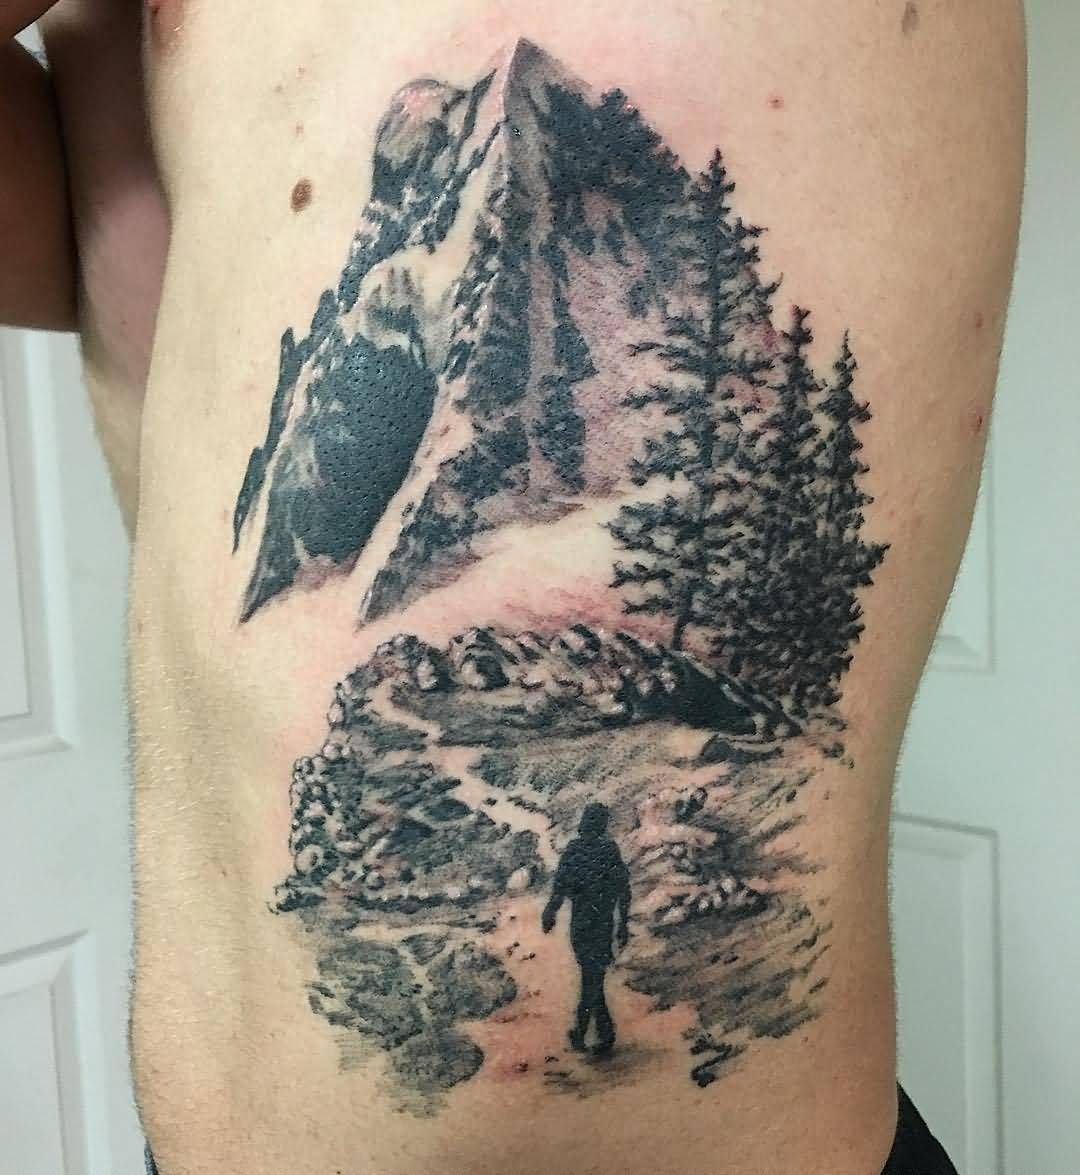 pingl par karin sur ren tattoos mountain tattoo et nature tattoos. Black Bedroom Furniture Sets. Home Design Ideas